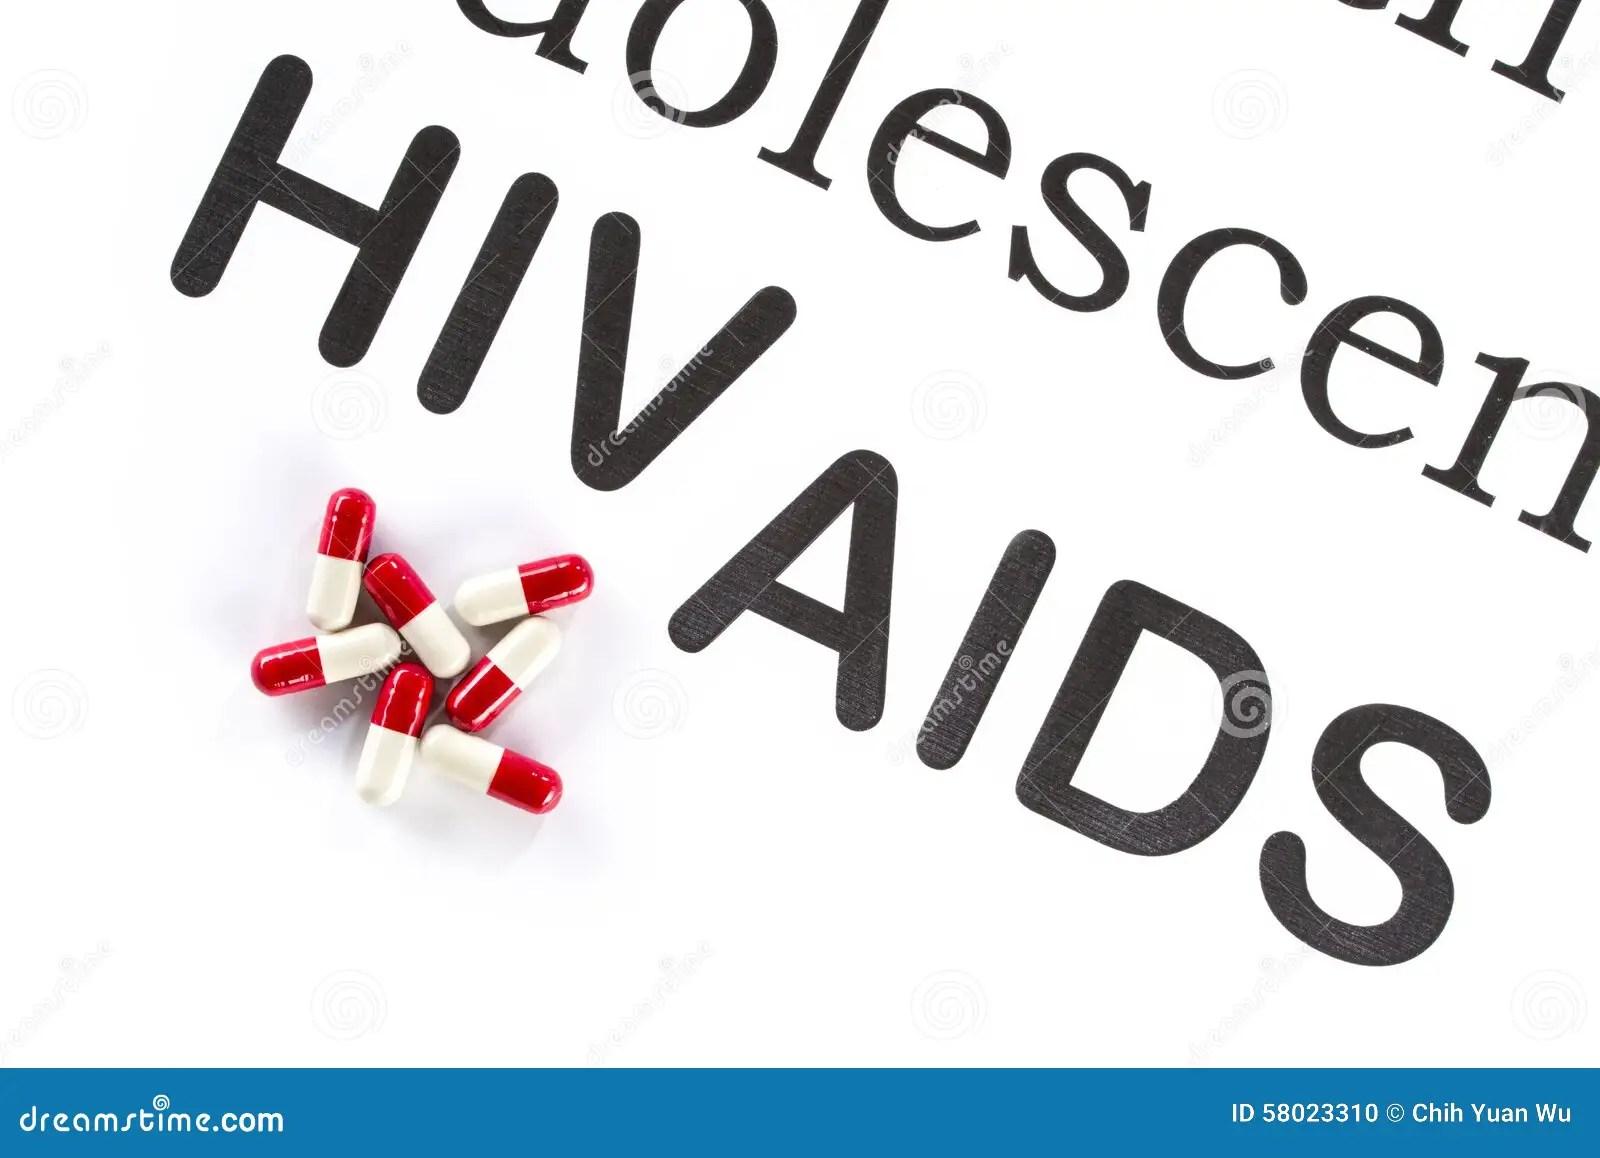 Best Virus Protection